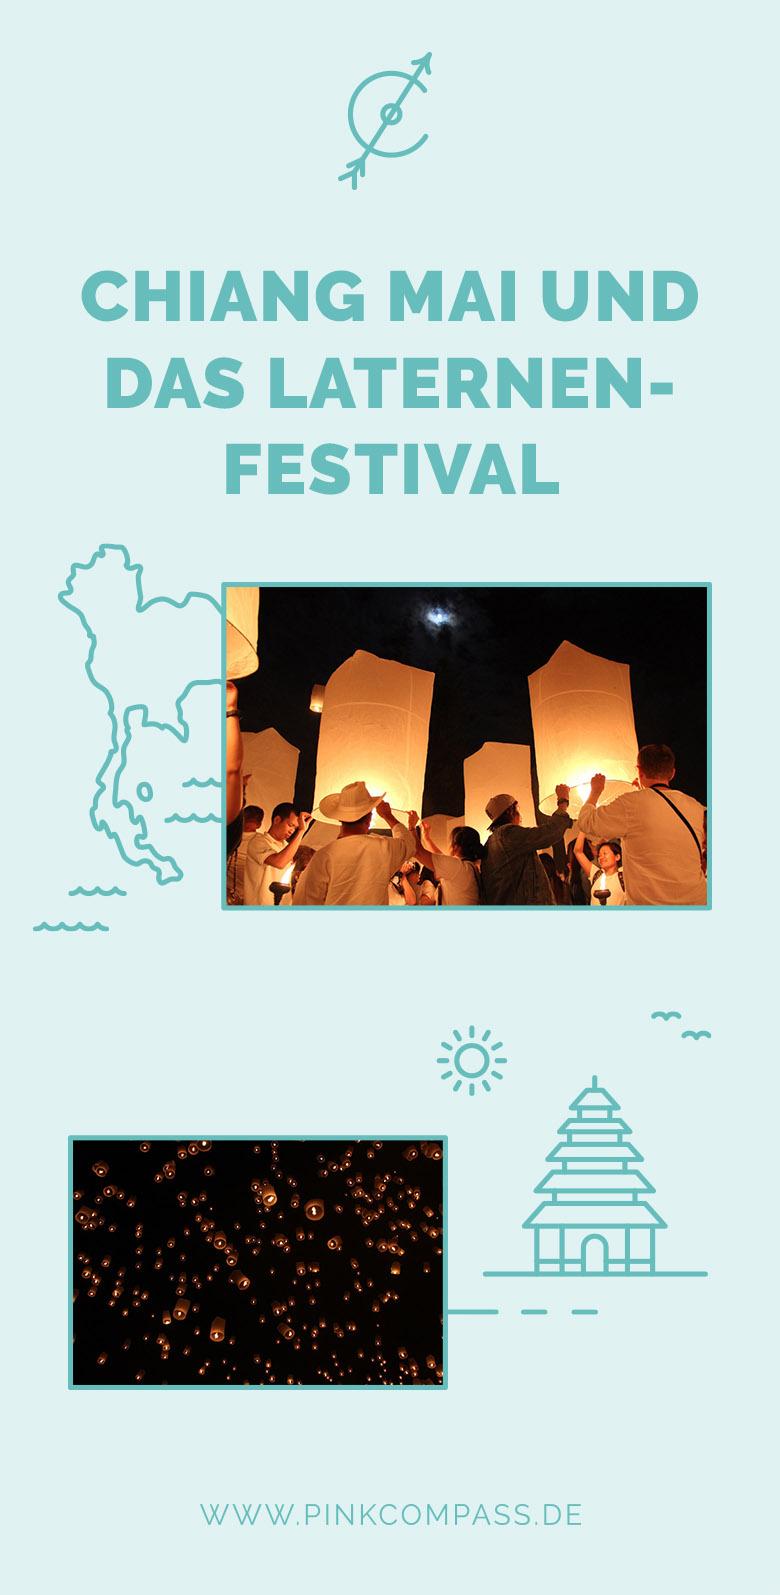 Das beeindrucktende Laternen-Festival in Chiang Mai